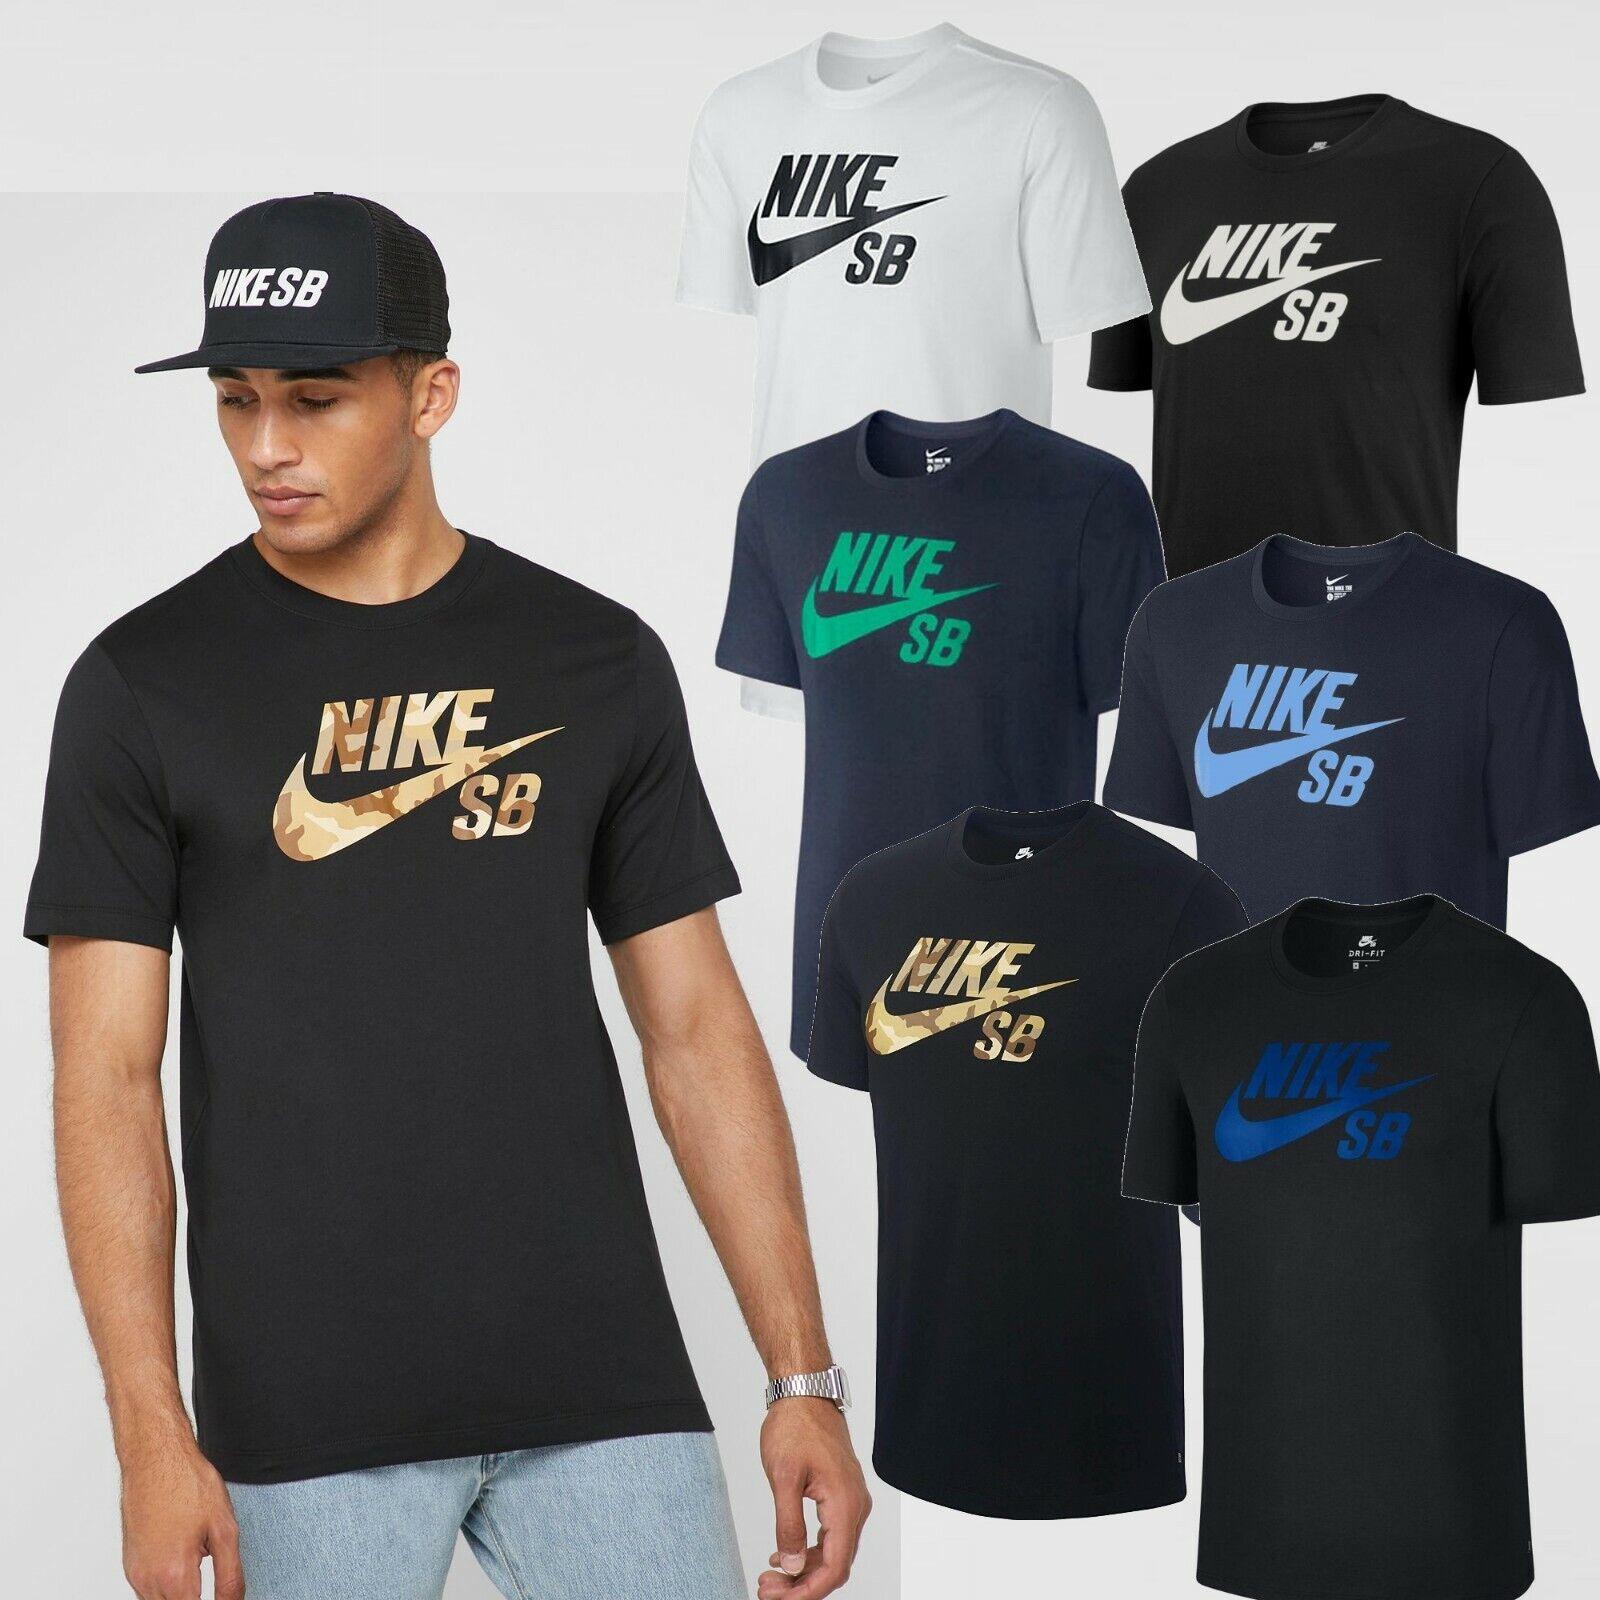 Swoosh Logo  Tee RRP £25 *Brand New* Nike Graphic Print T-Shirt Top S